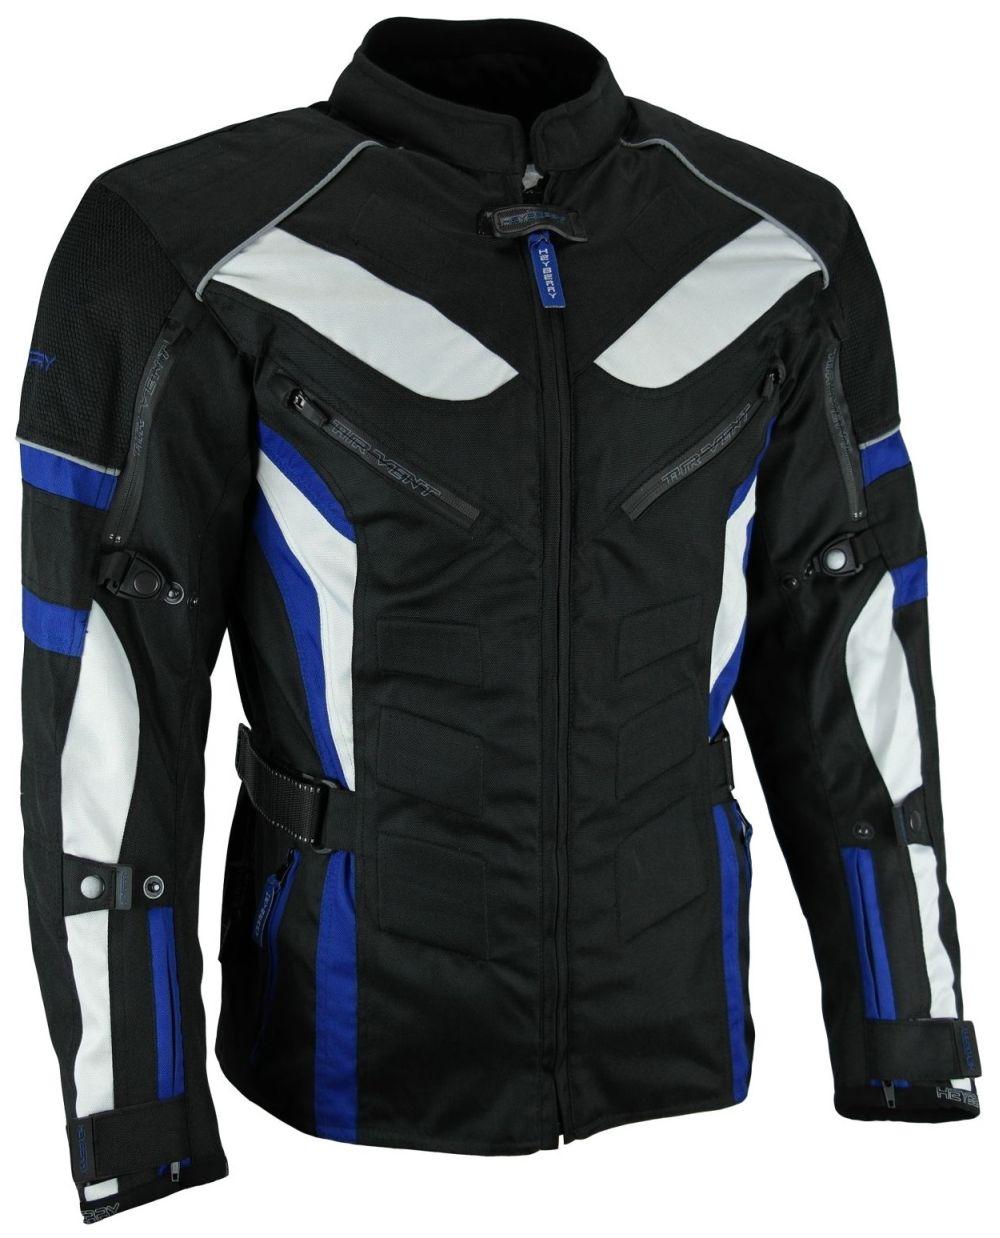 Heyberry Touren Motorrad Jacke Motorradjacke Textil schwarz blau Gr. M - 3XL